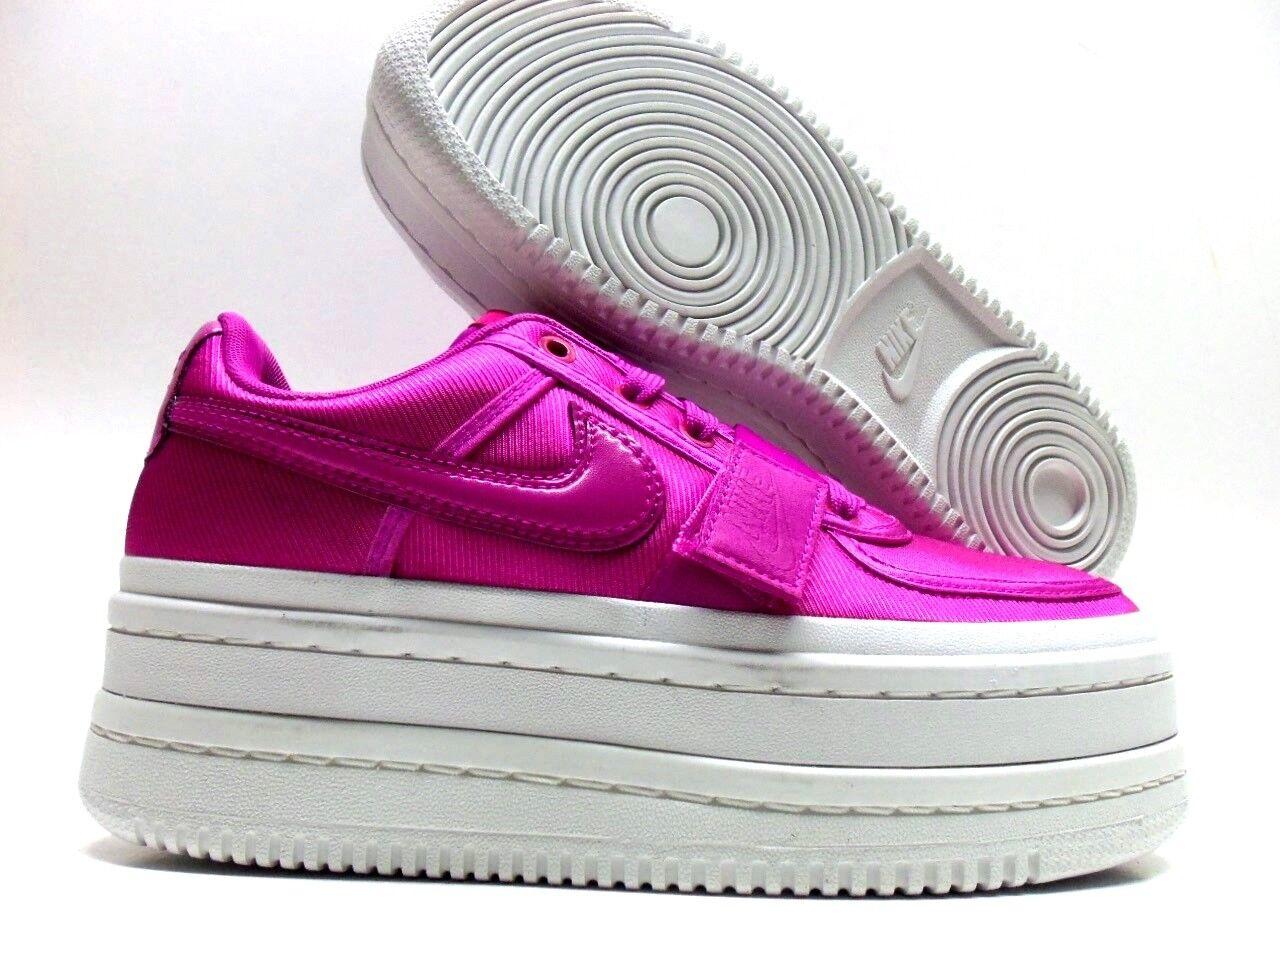 Nike Sock Dart And Vandal 2K 10 Nike Vandal 2k Double Stack Casual Platform Magenta Pink White ...